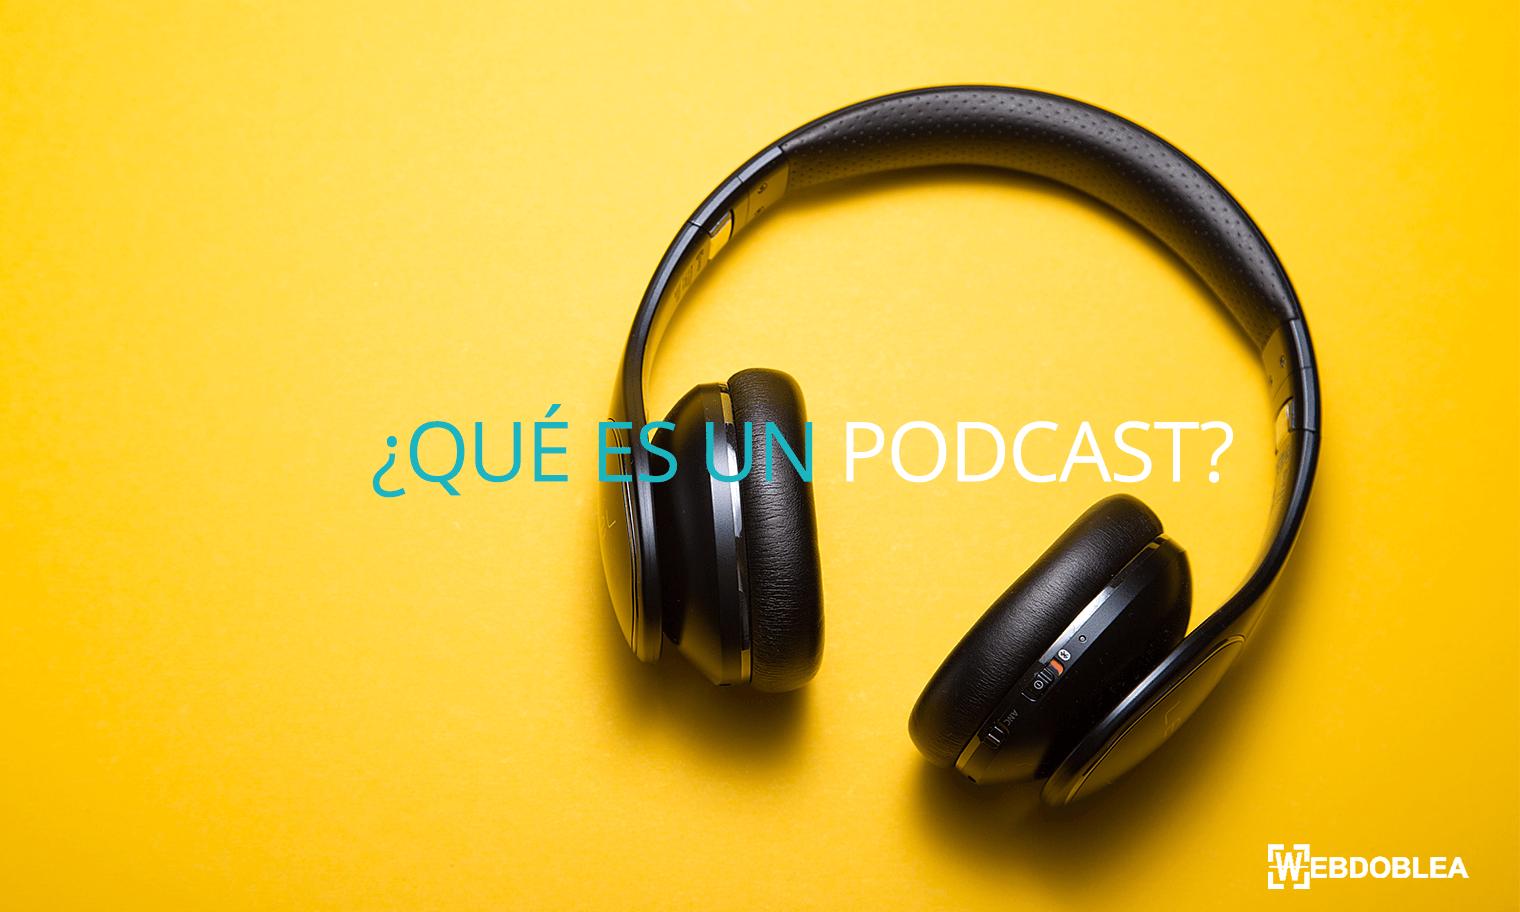 que_es_podcast